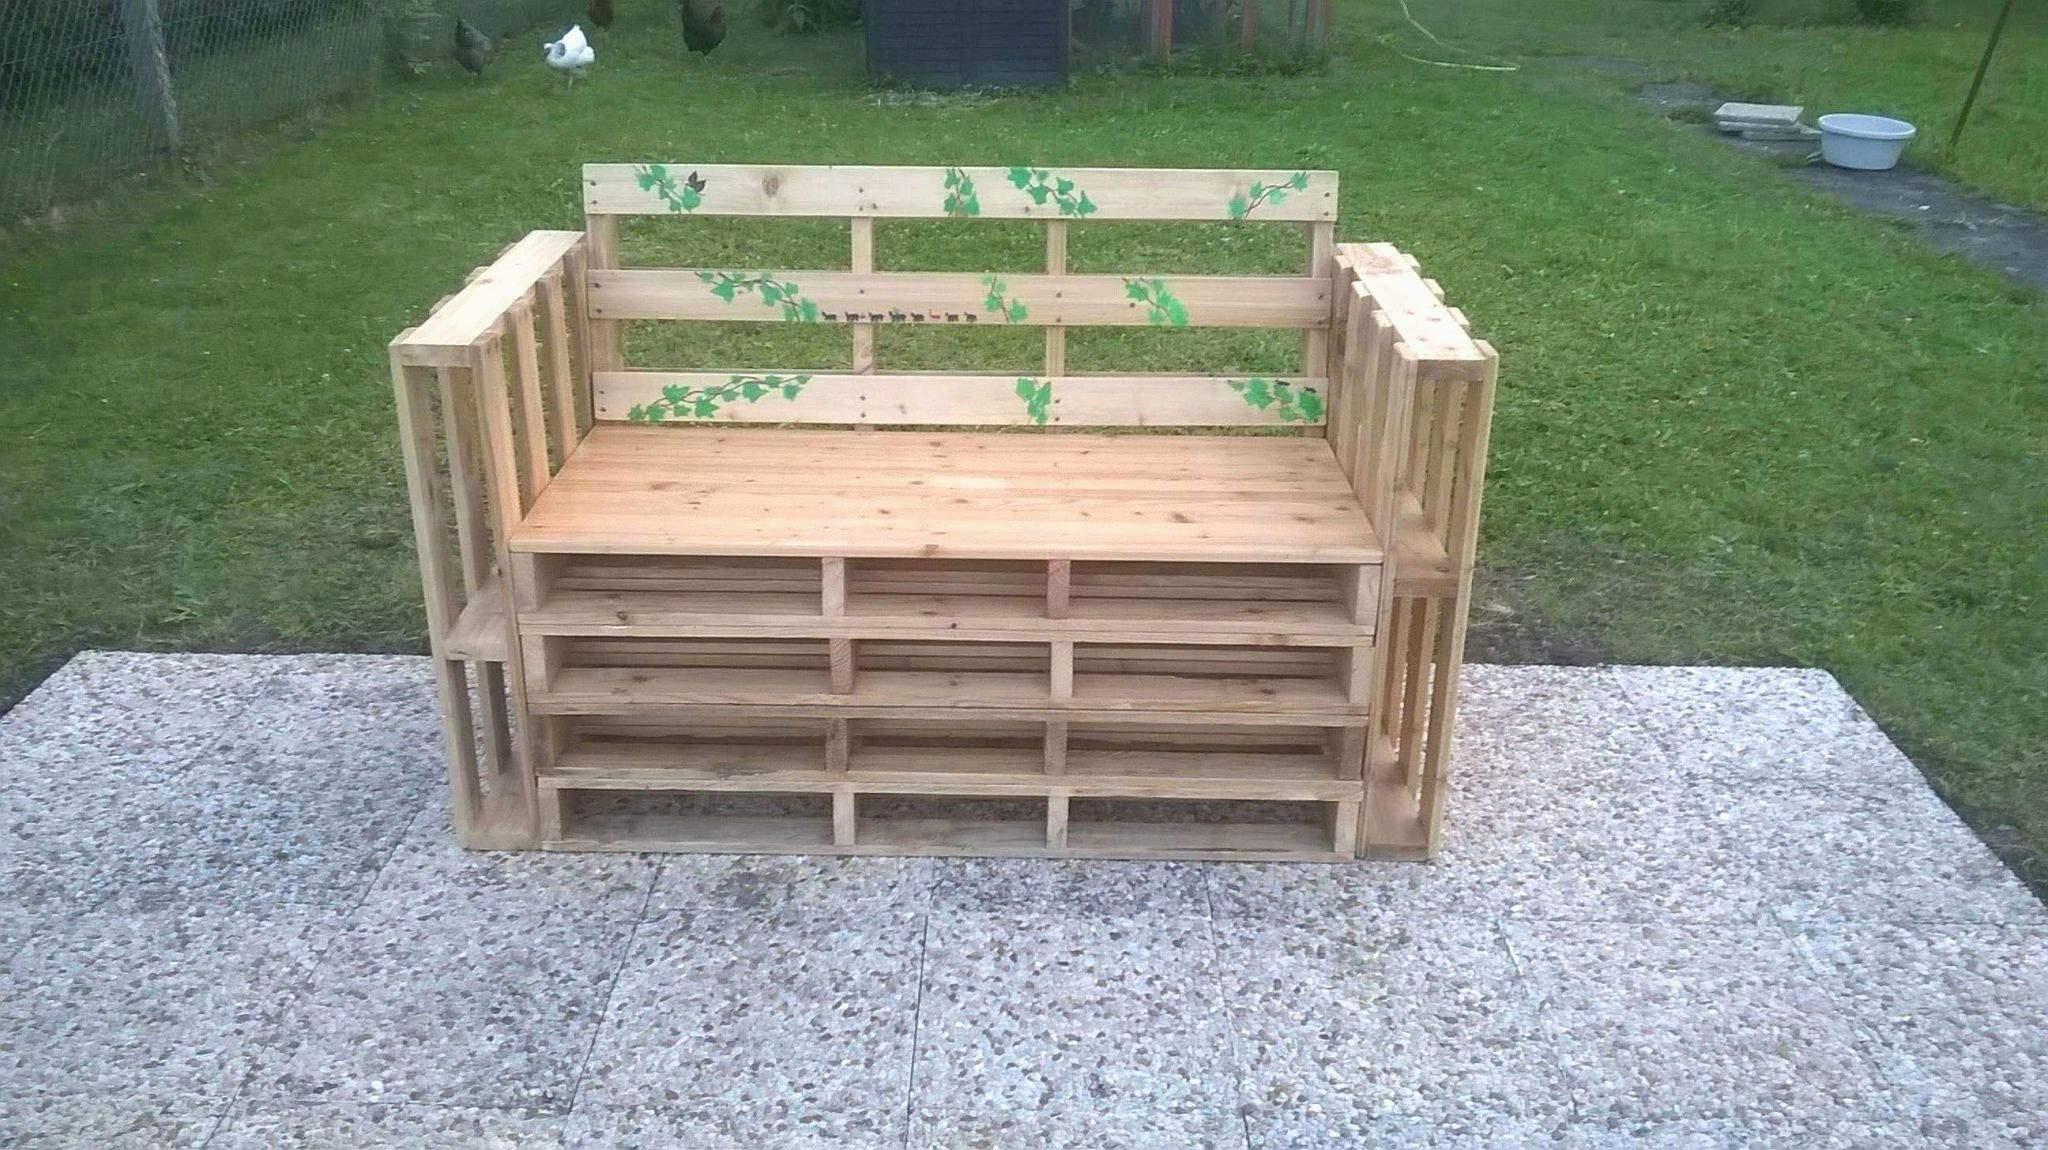 35 Charmant Serre De Jardin   Jardin De Rêve pour Salon De Jardin En Soldes